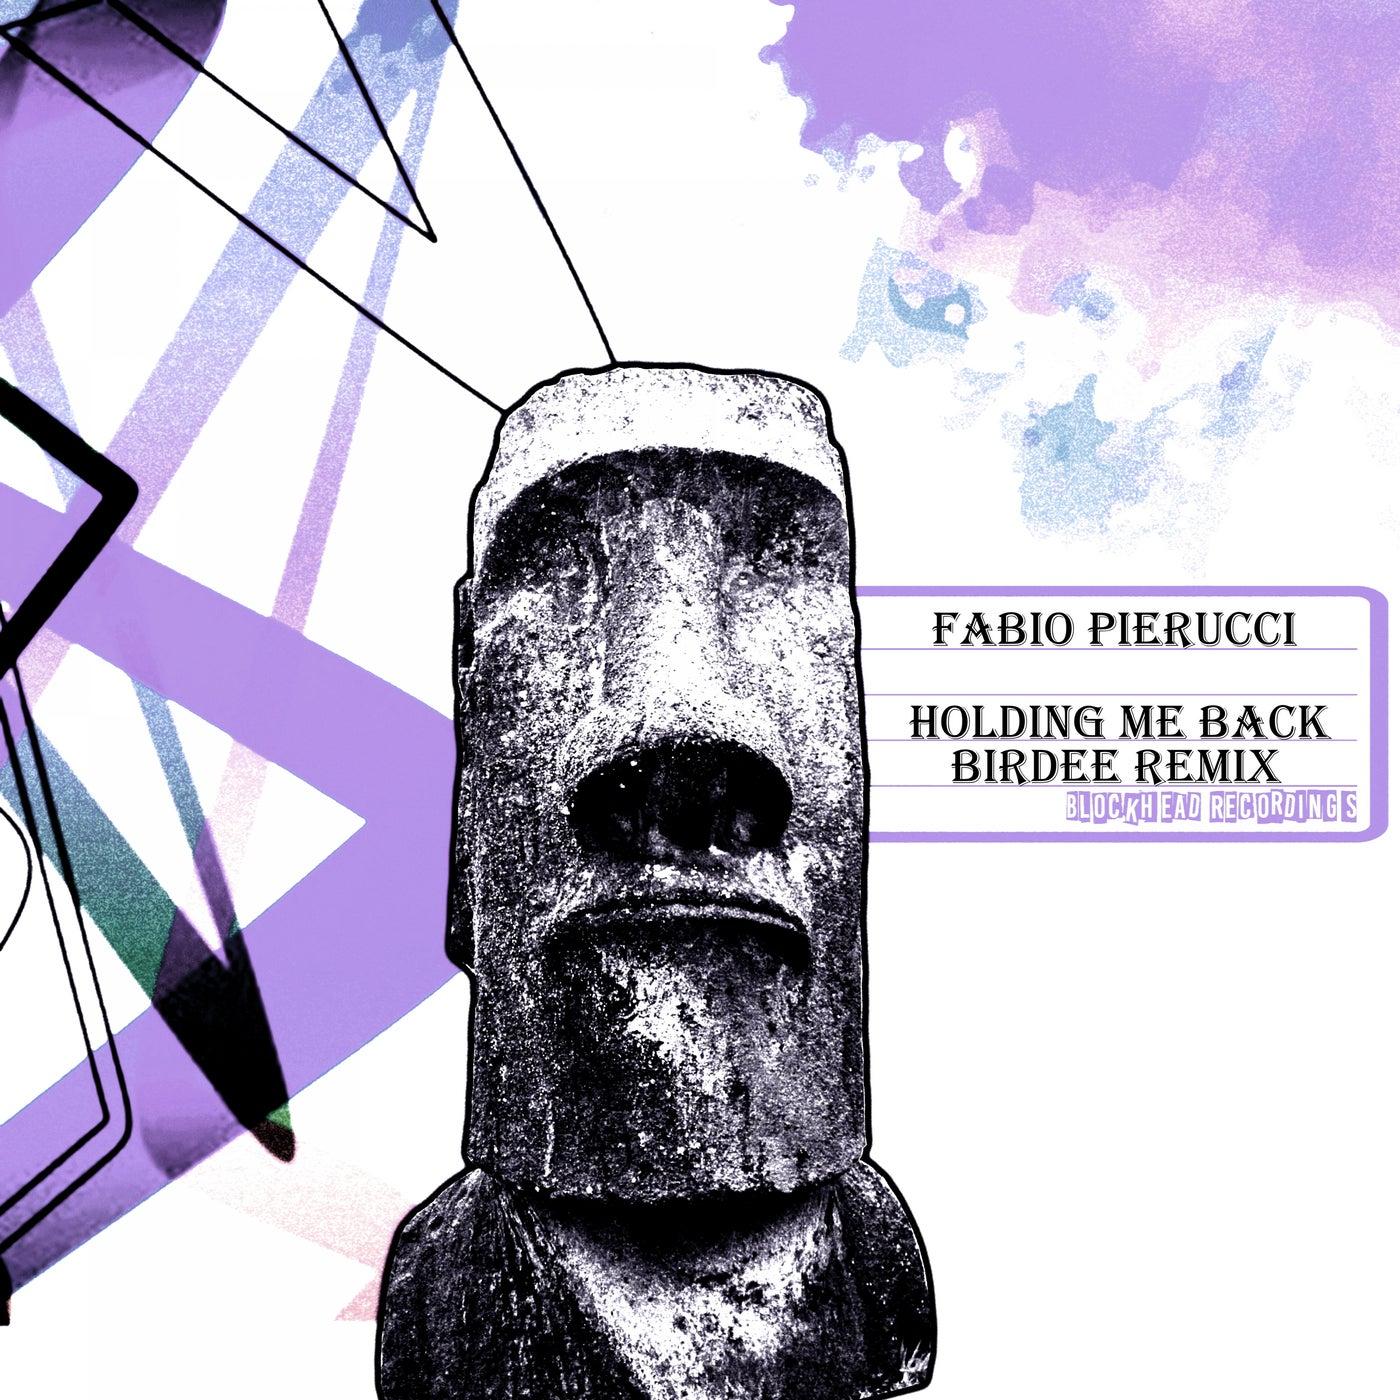 Holding Me Back (Birdee Remix)